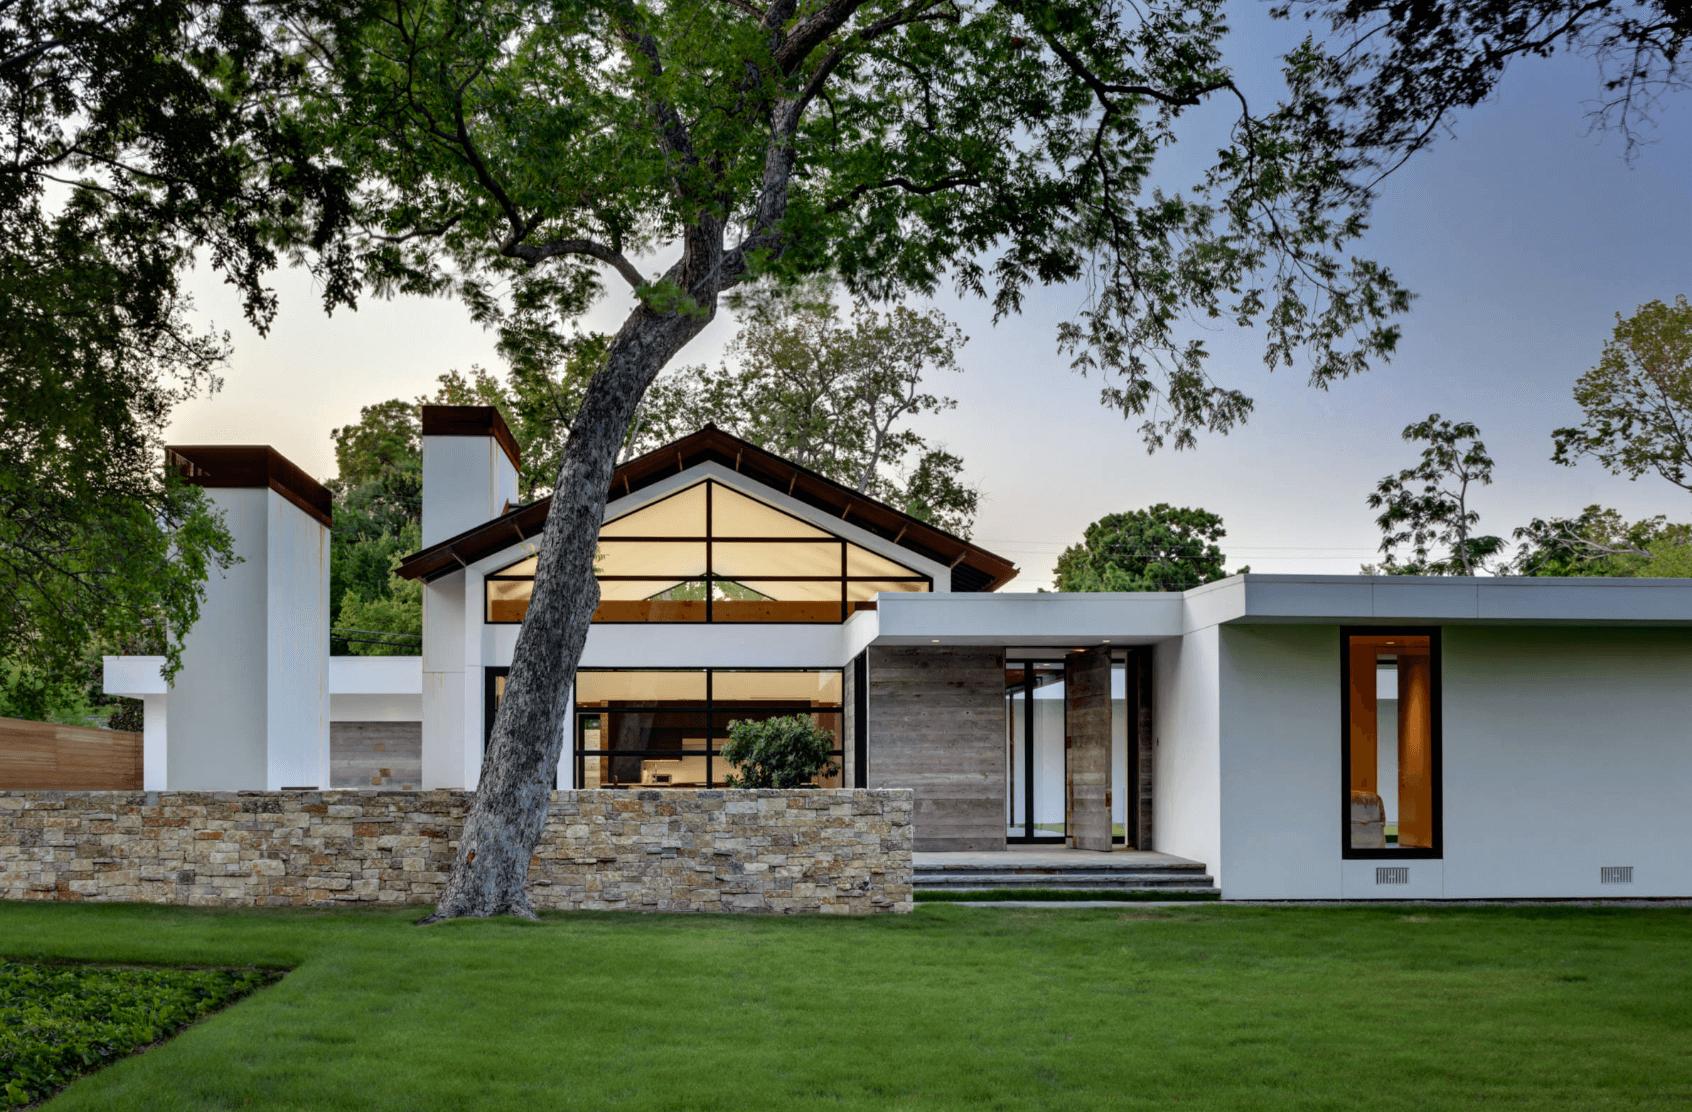 Modern Ranch Homes